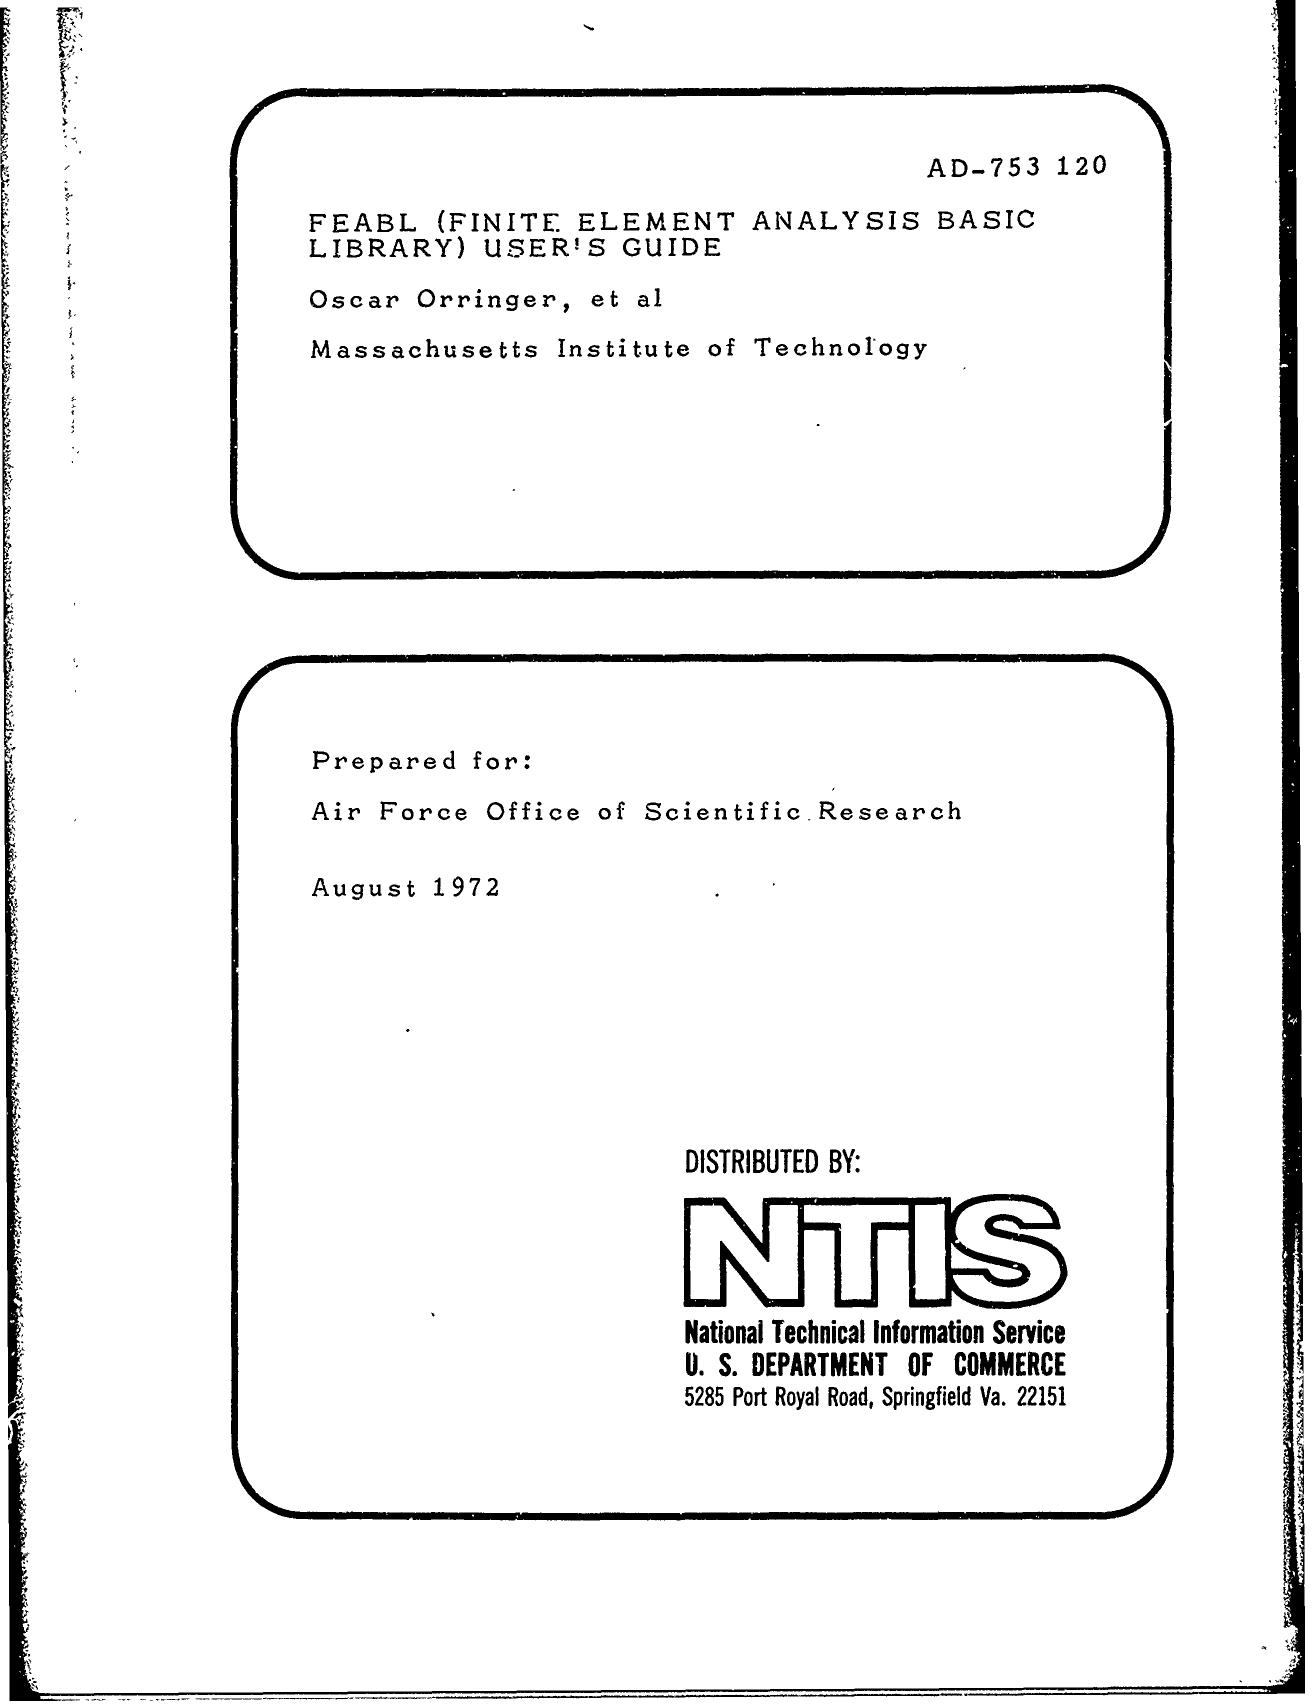 pdf for jWIN Digital Photo Frame JP-197 manual